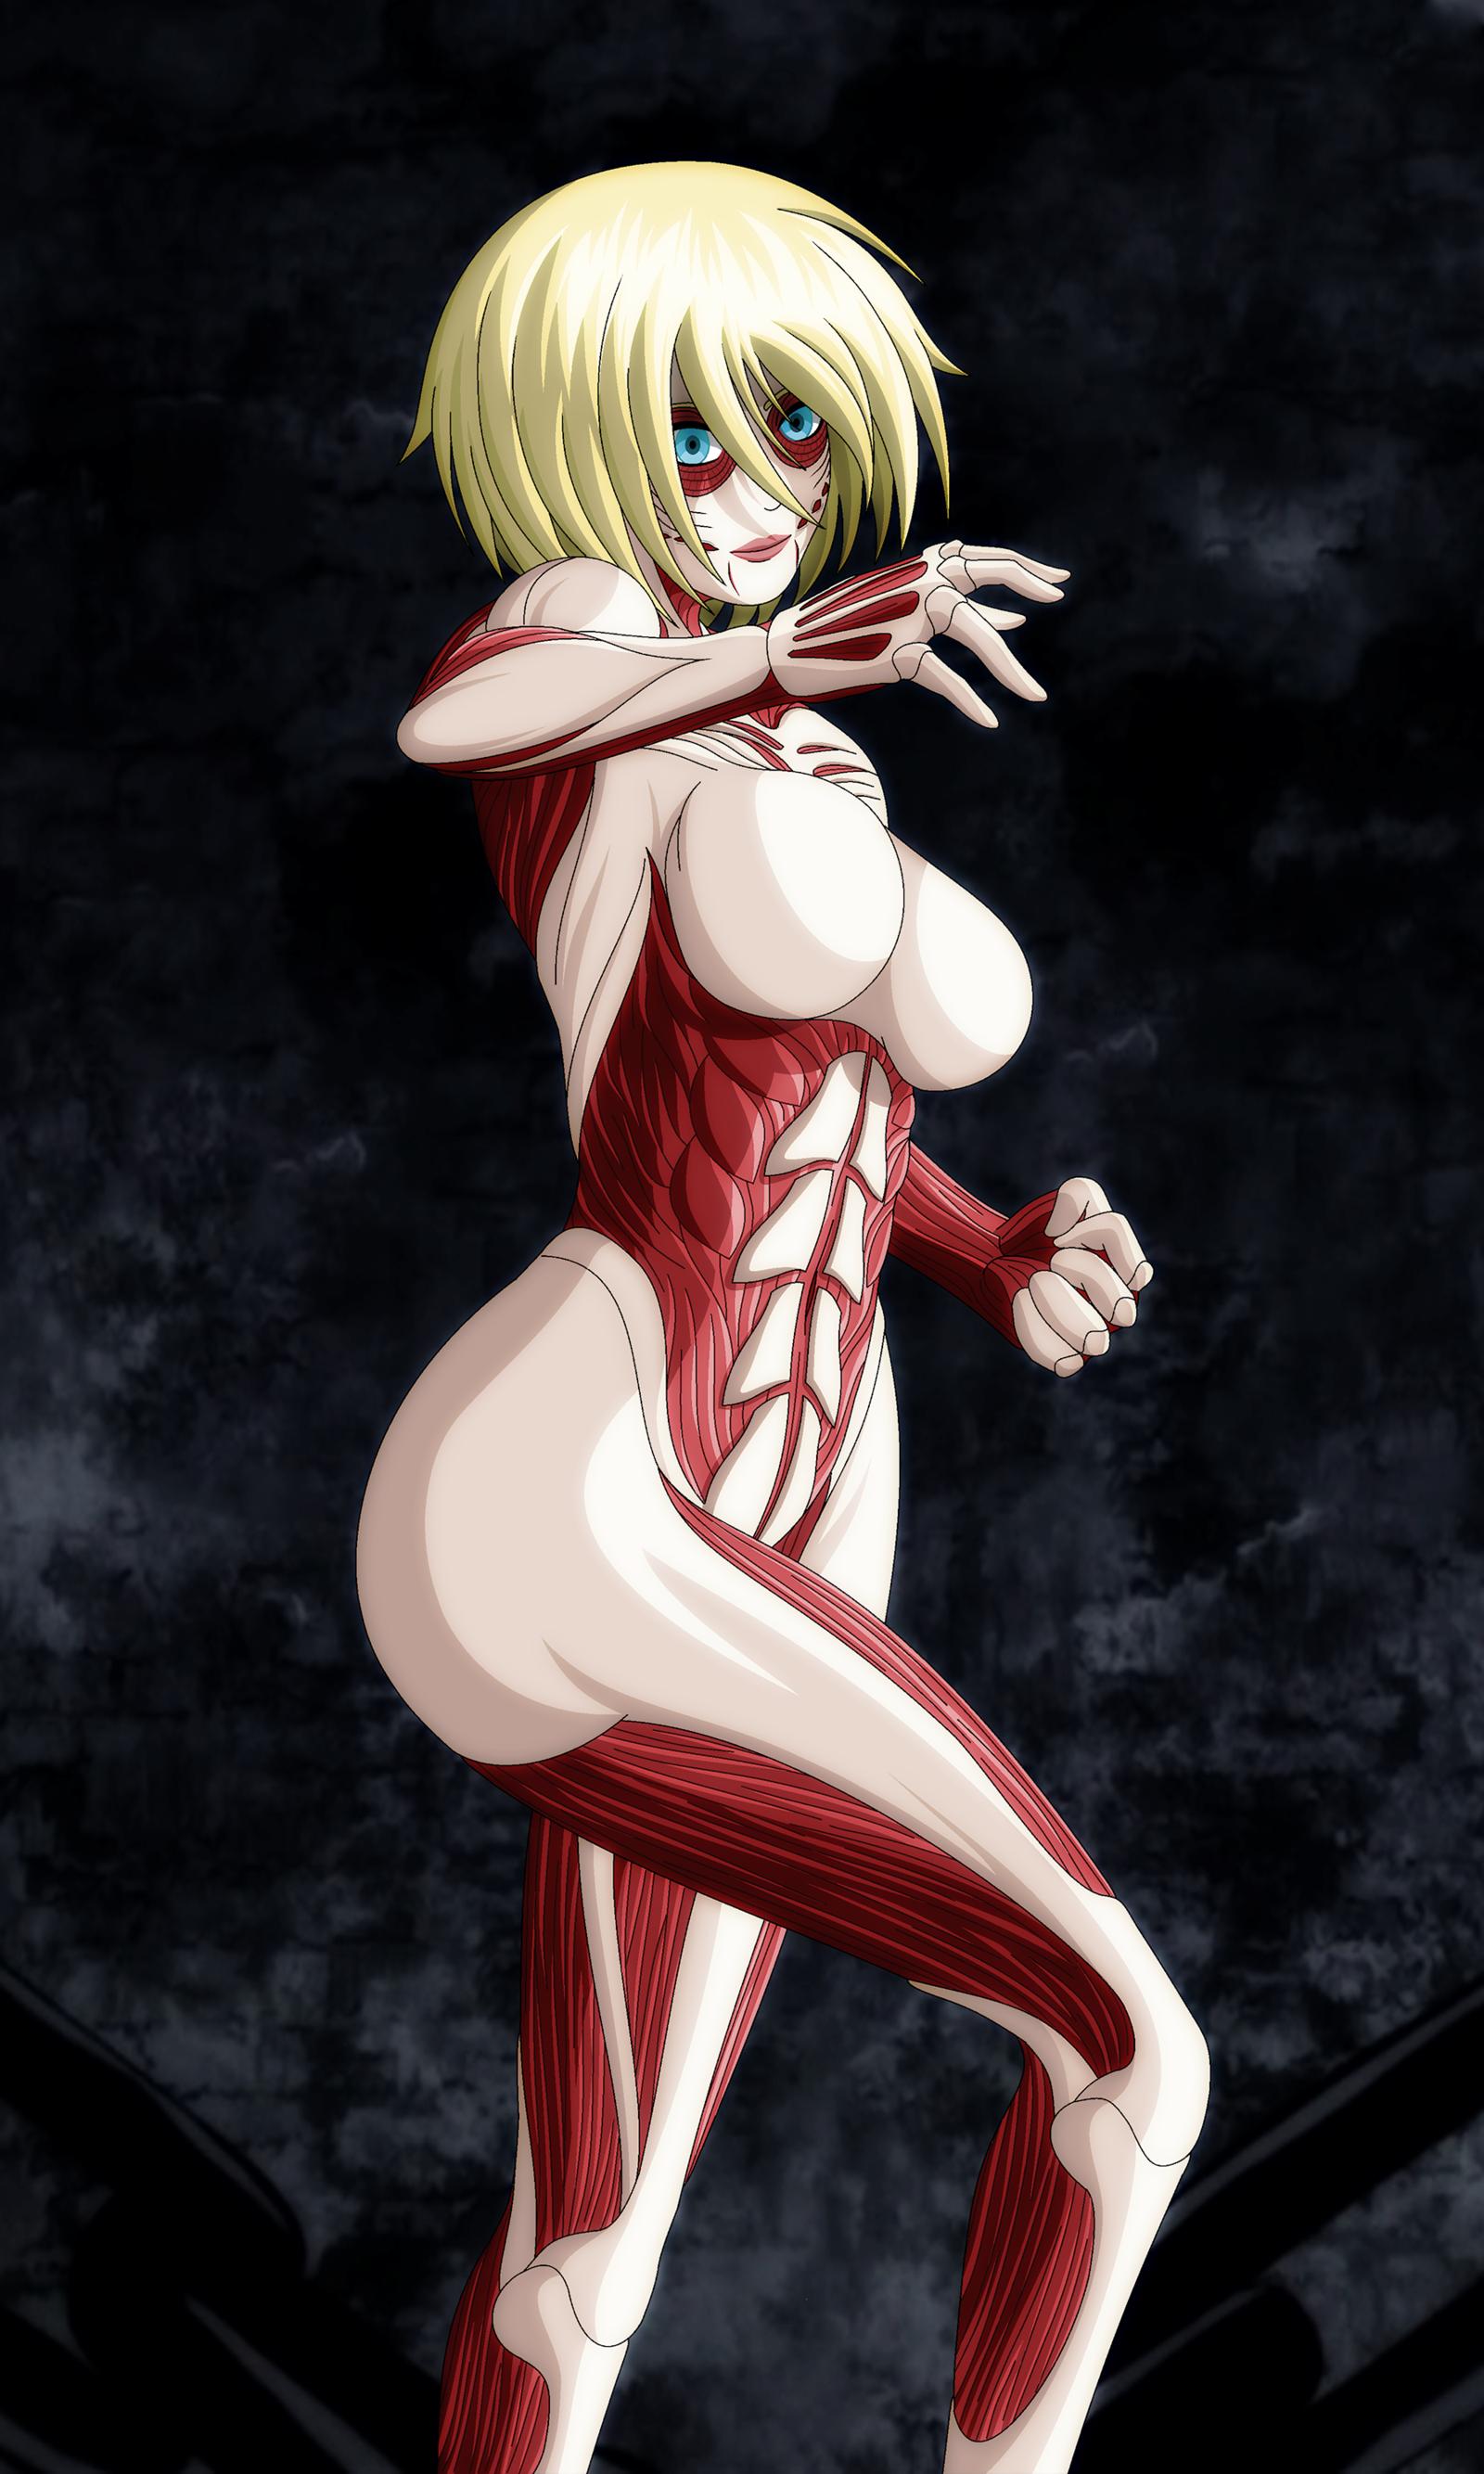 Female titan by ZantyARZ on deviantART | Female titan, Attack on titan anime, Attack on titan